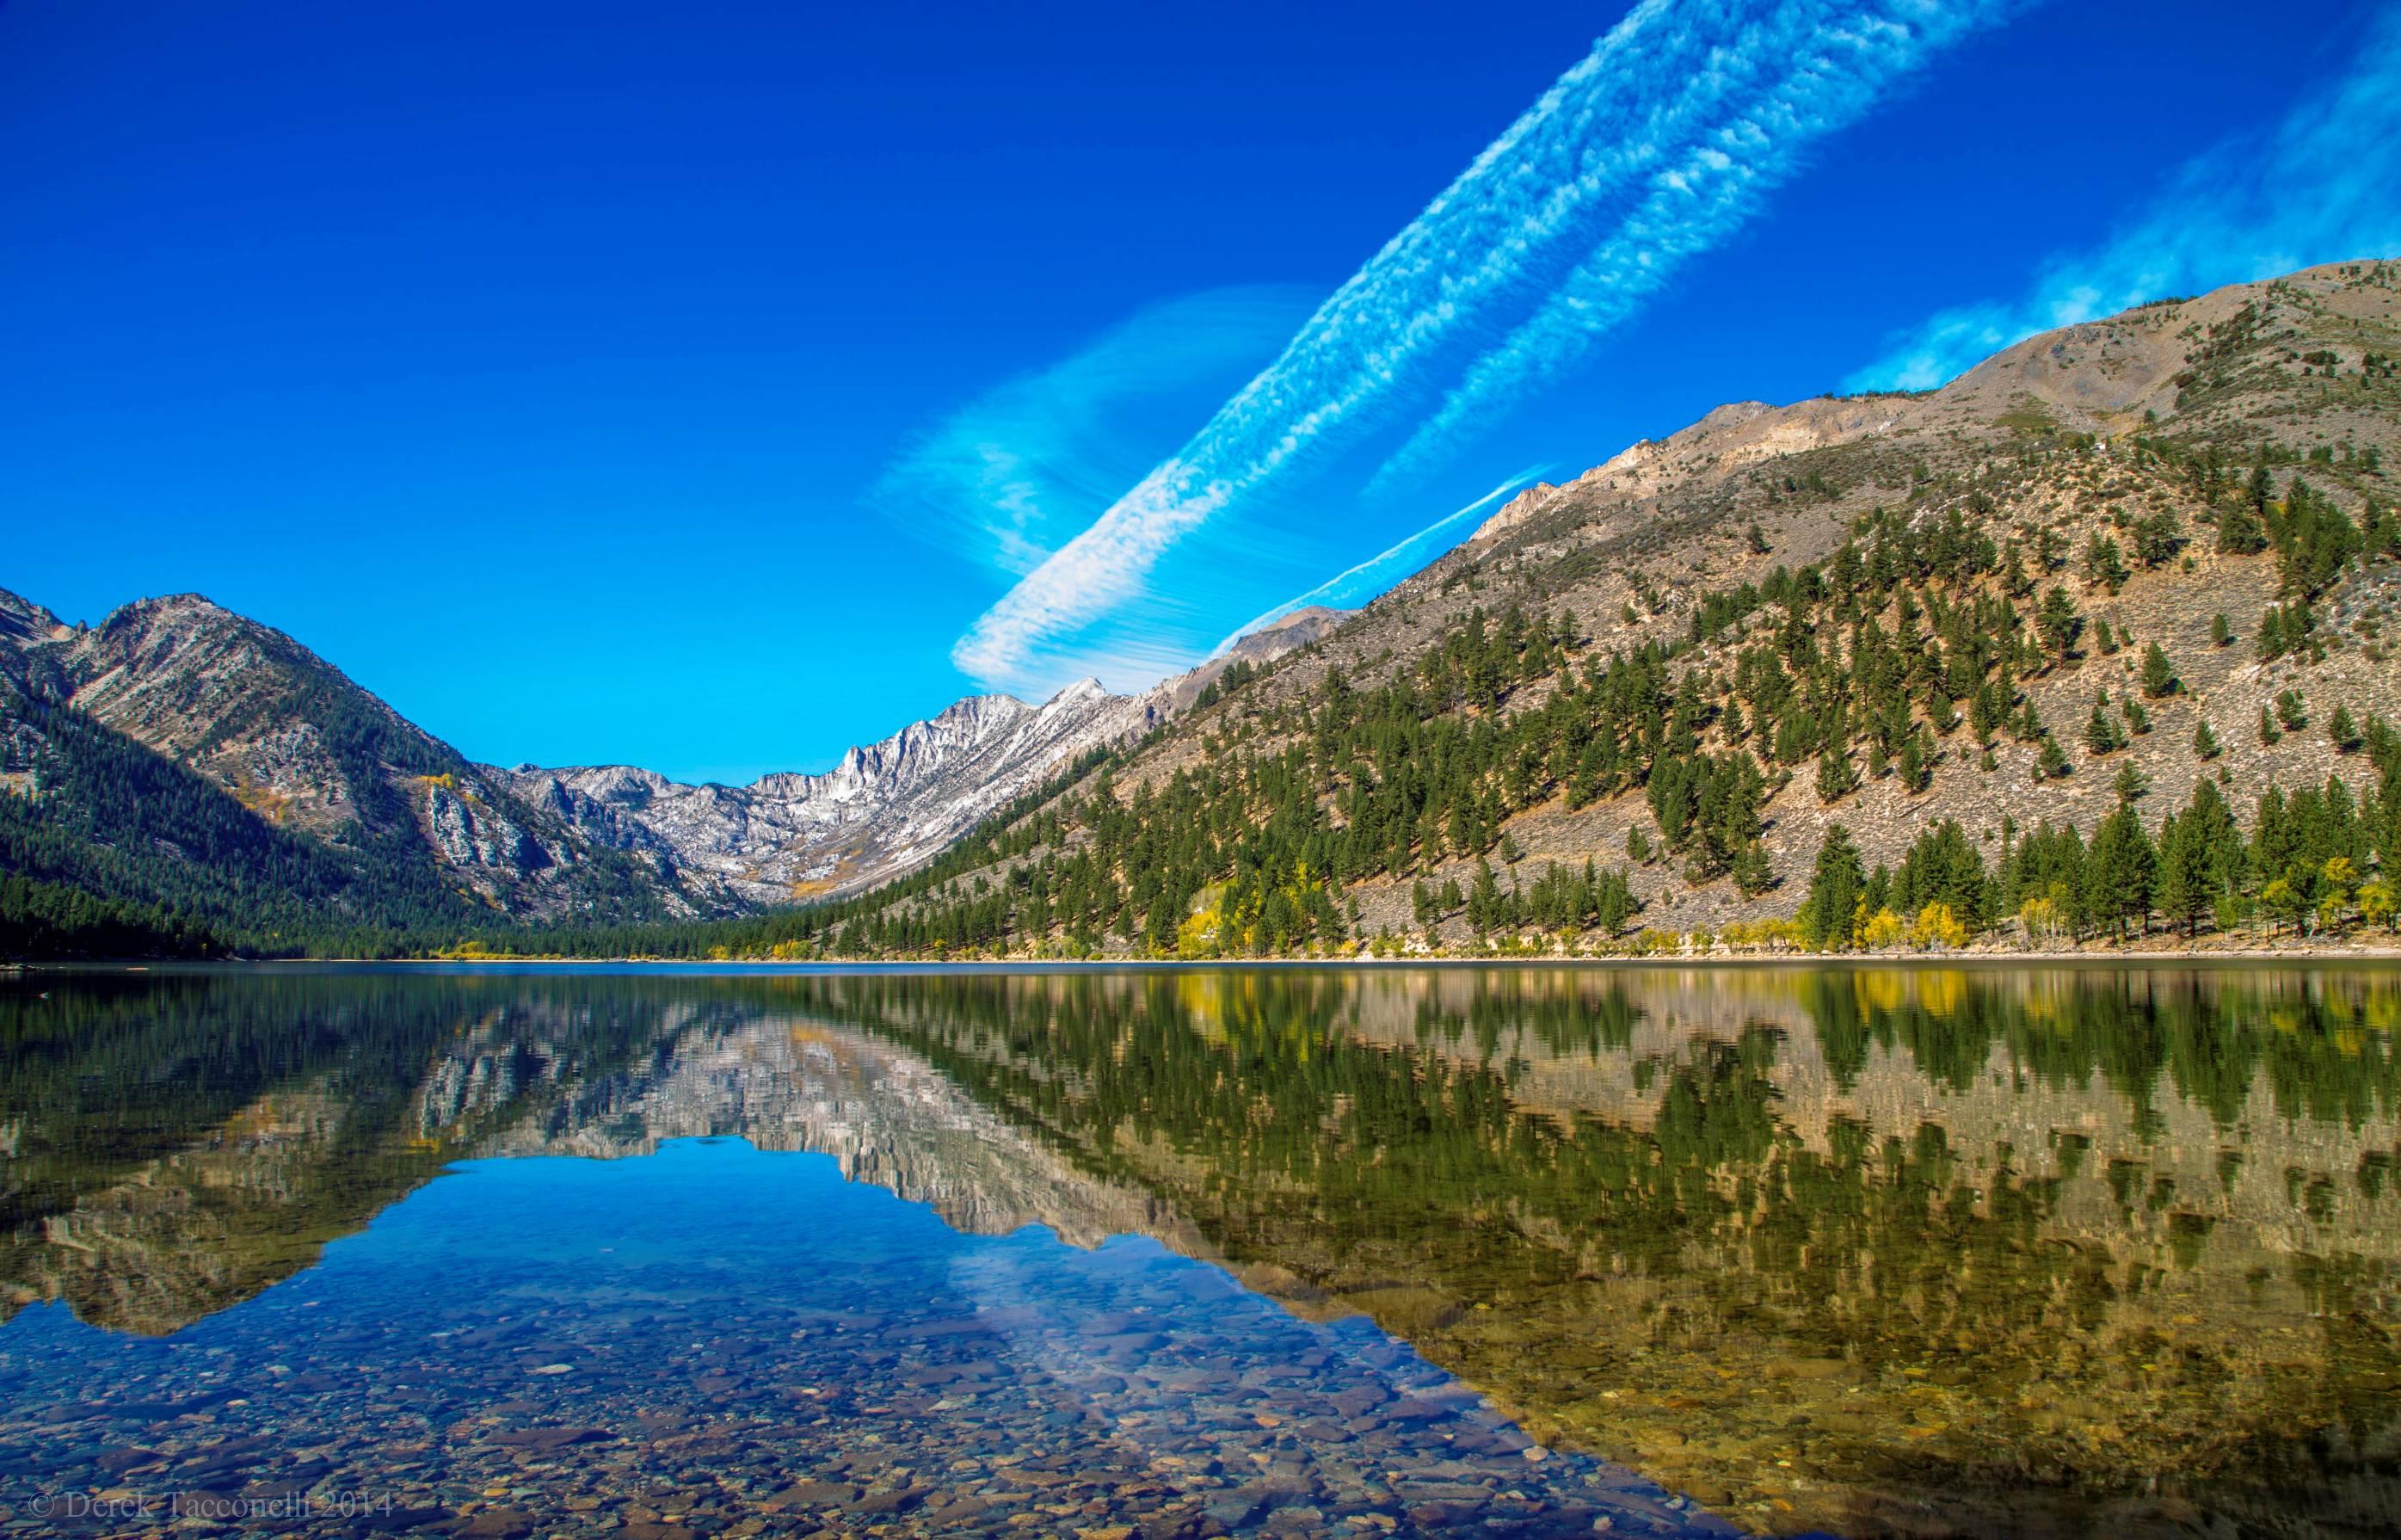 Верхнее_озеро_Канада_красивое_озеро_великое_озеро